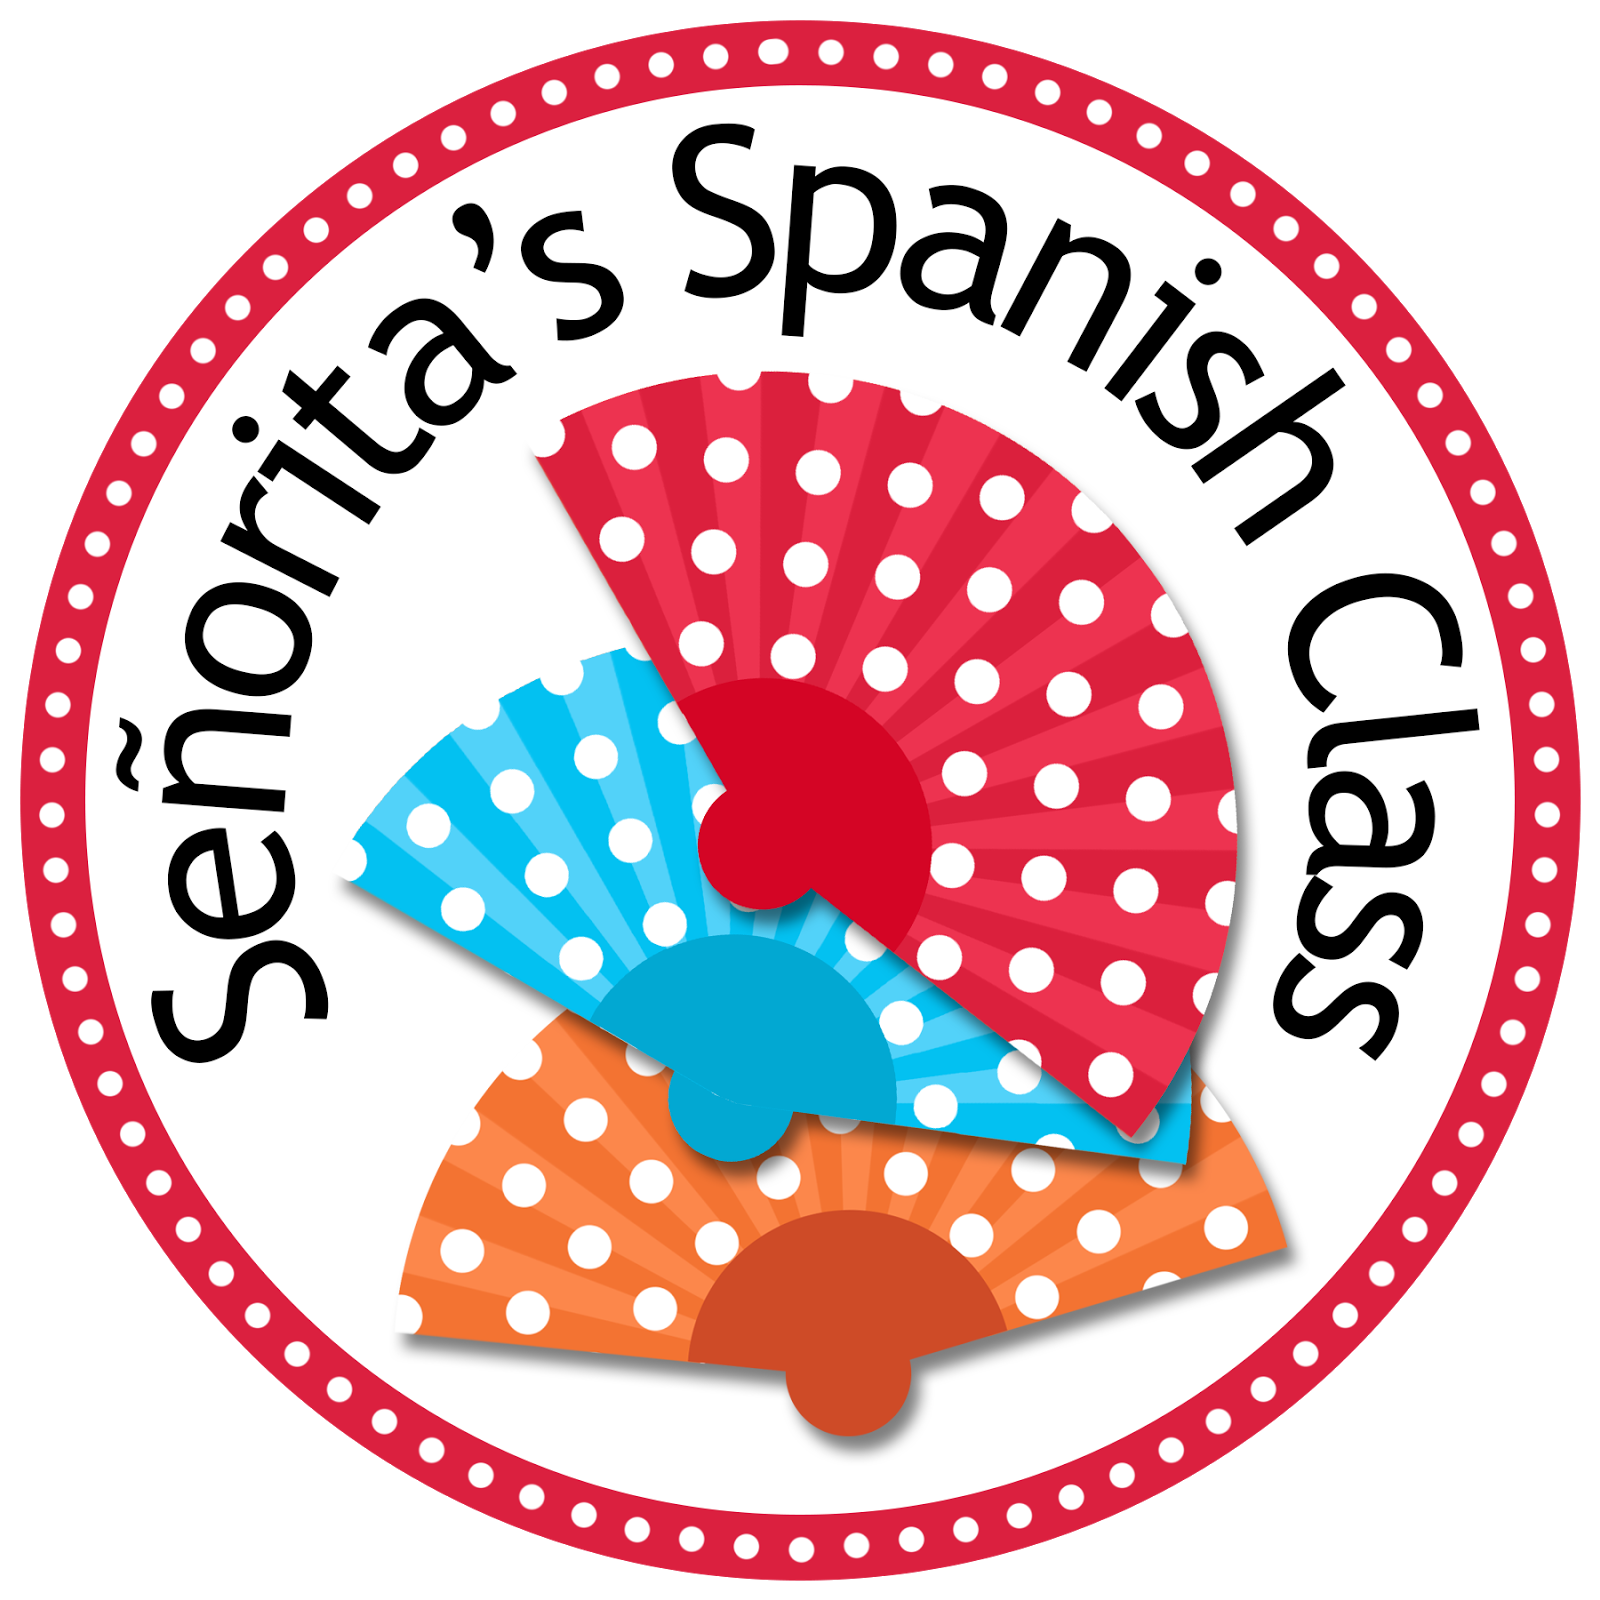 Señorita's Spanish Class